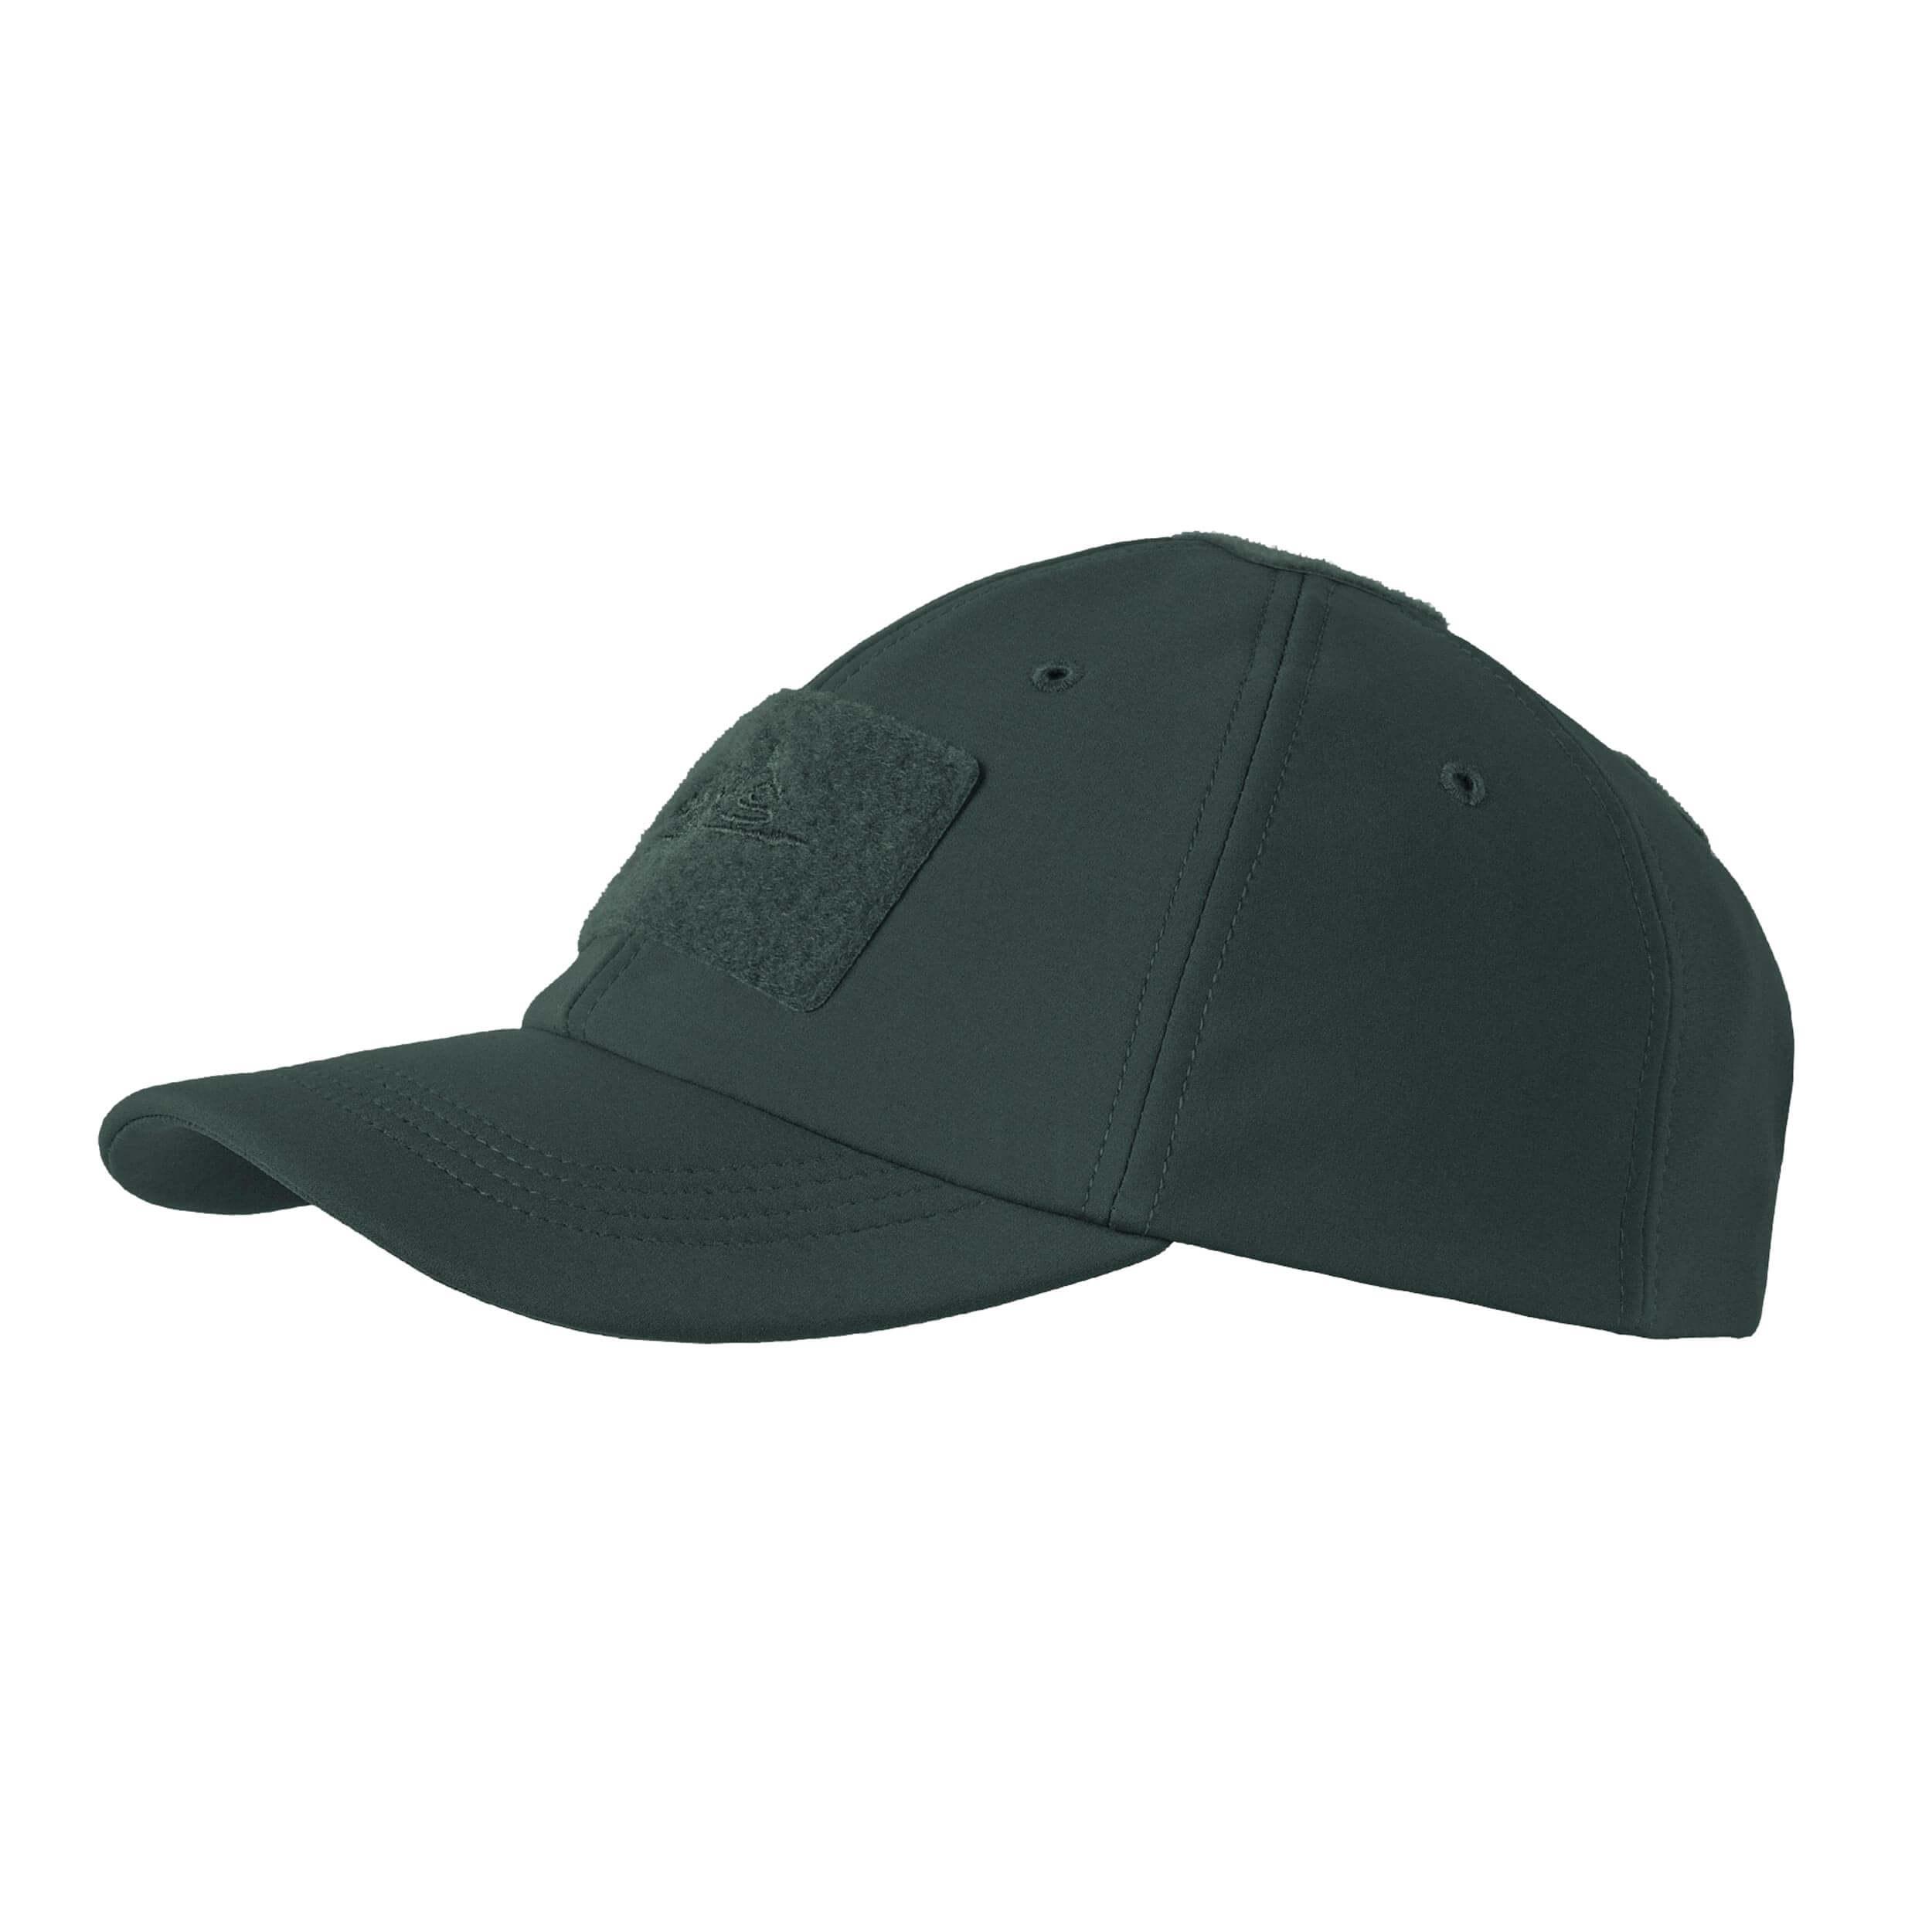 Helikon-Tex BBC Winter Cap -Shark Skin- Jungle Green